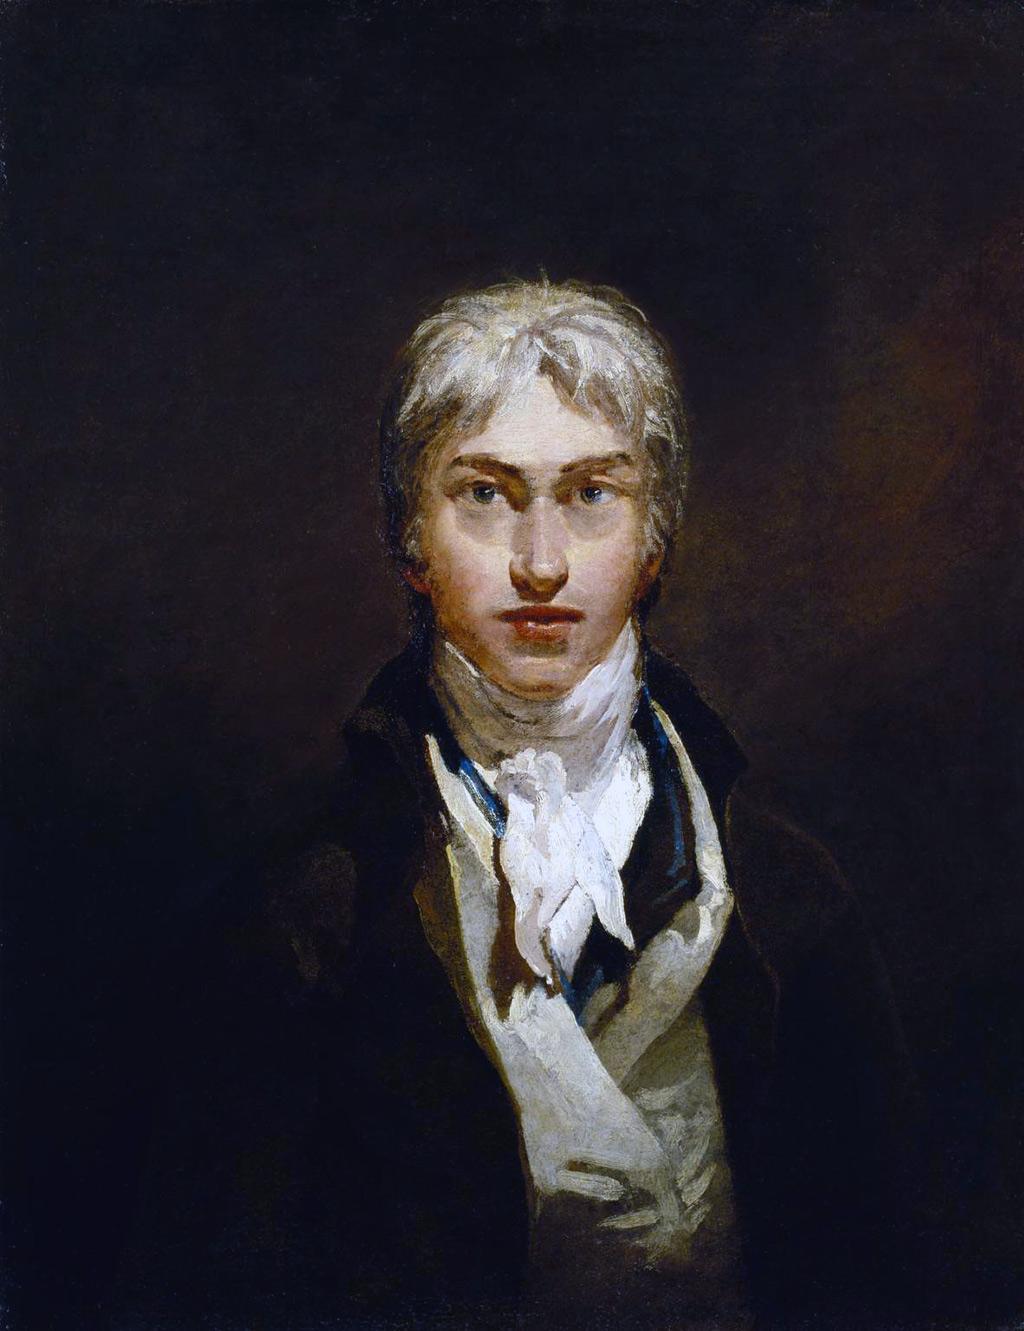 Artist: Turner, William